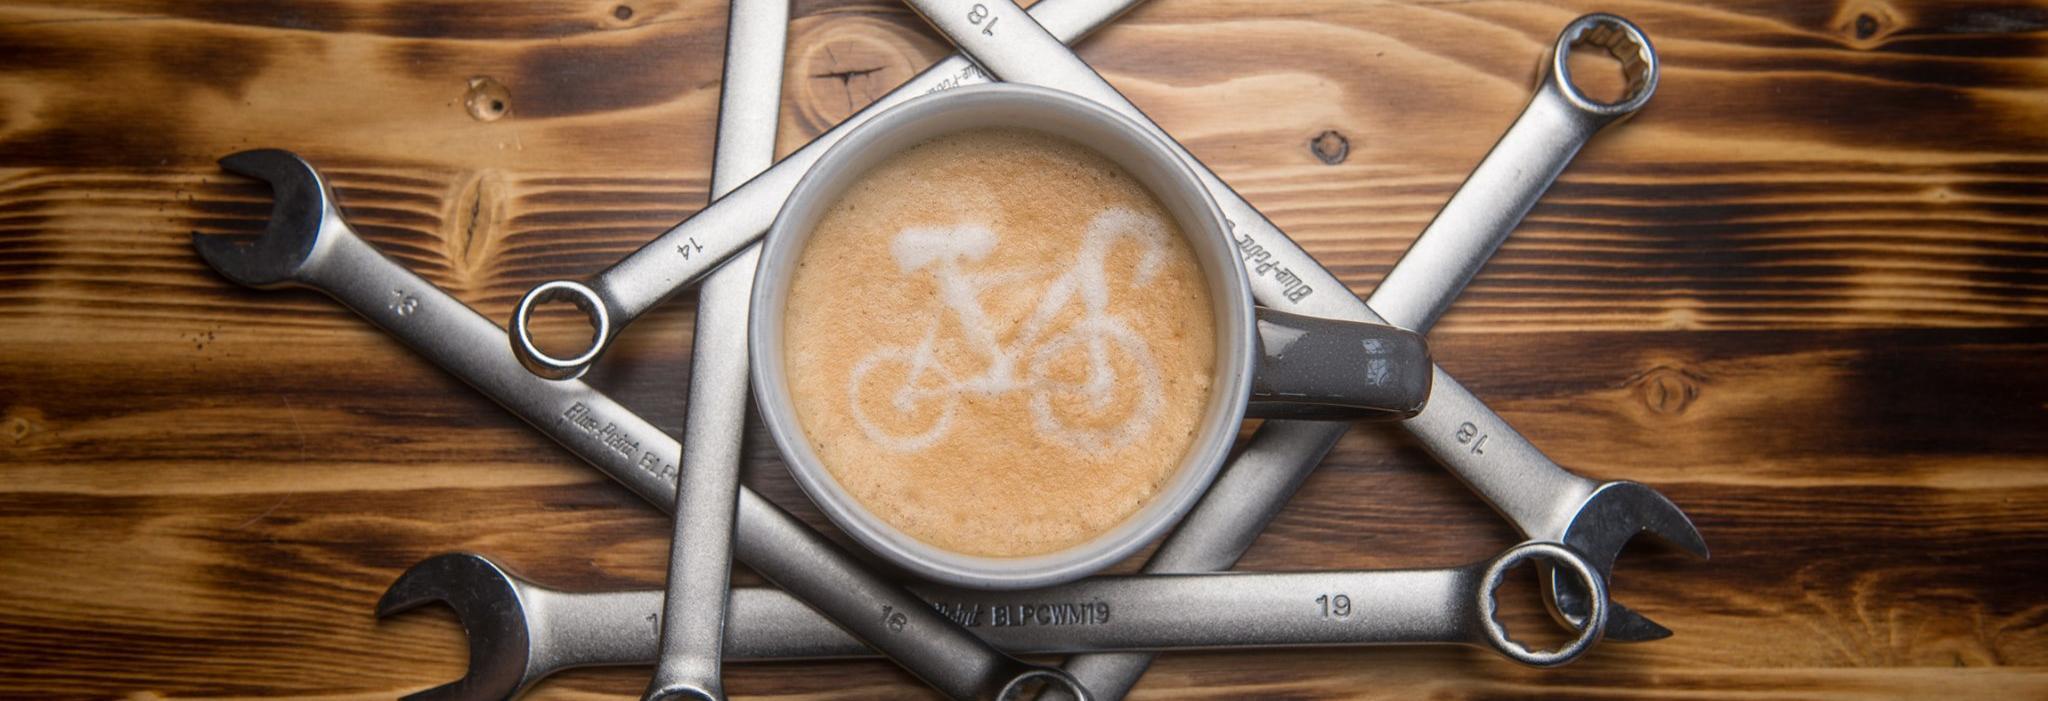 PIM Bikes & Coffee in Seattle, WA banner image